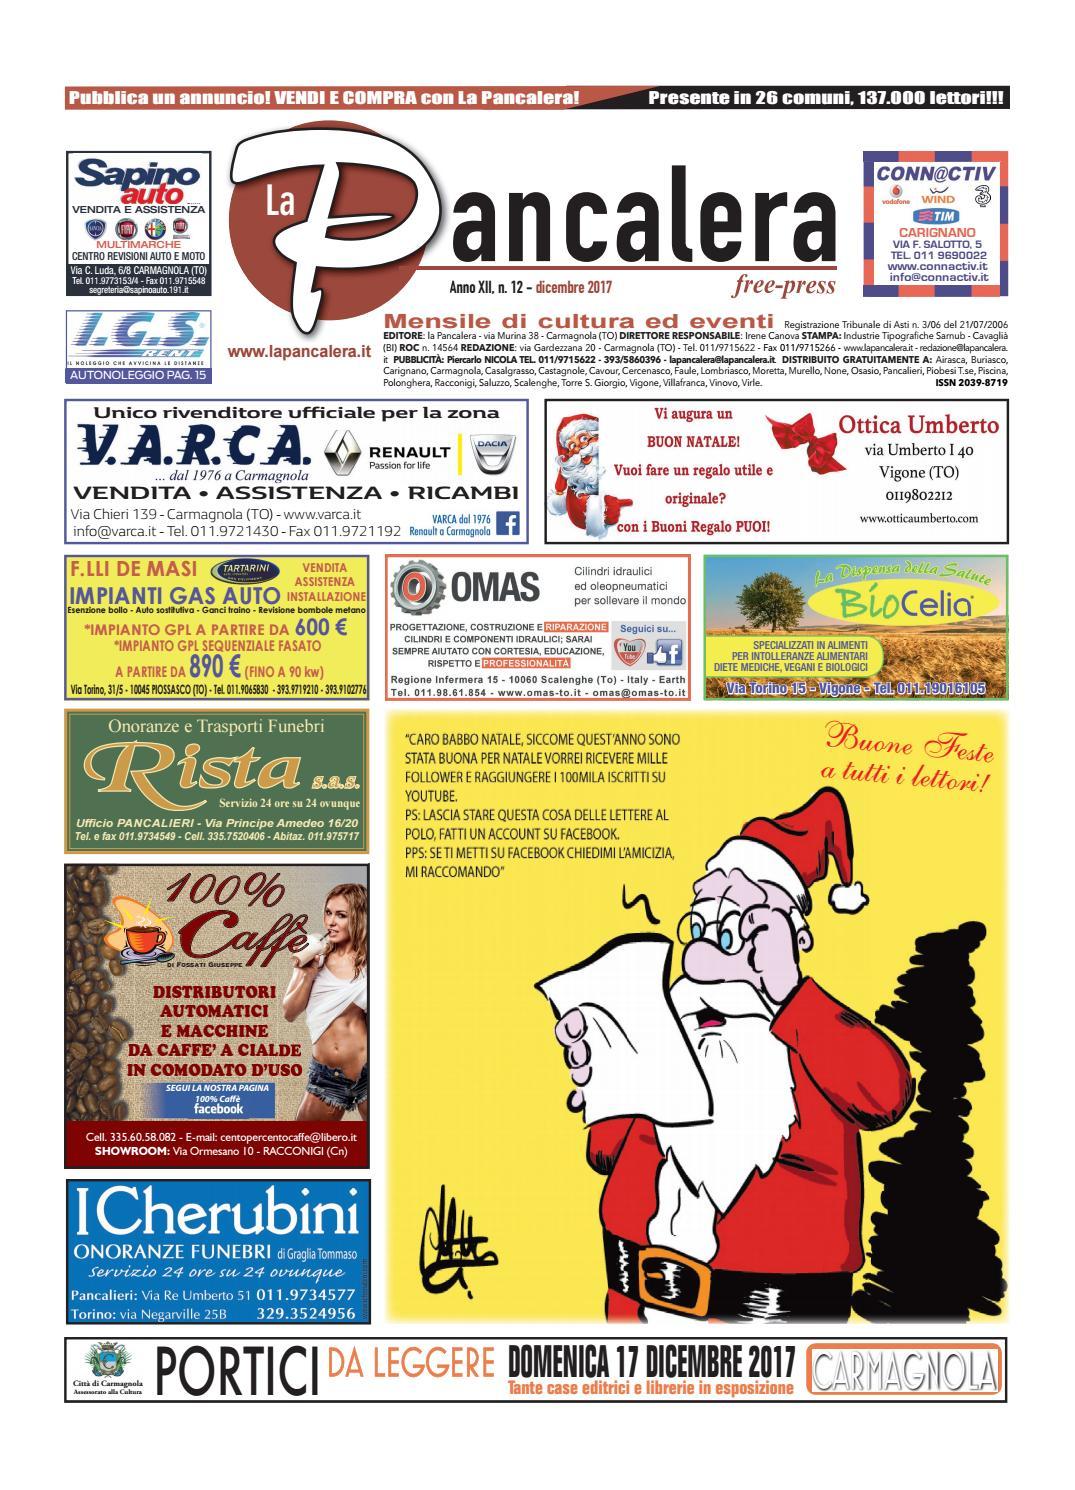 La pancalera dicembre 2017 by la Pancalera - issuu bec4cf483ae